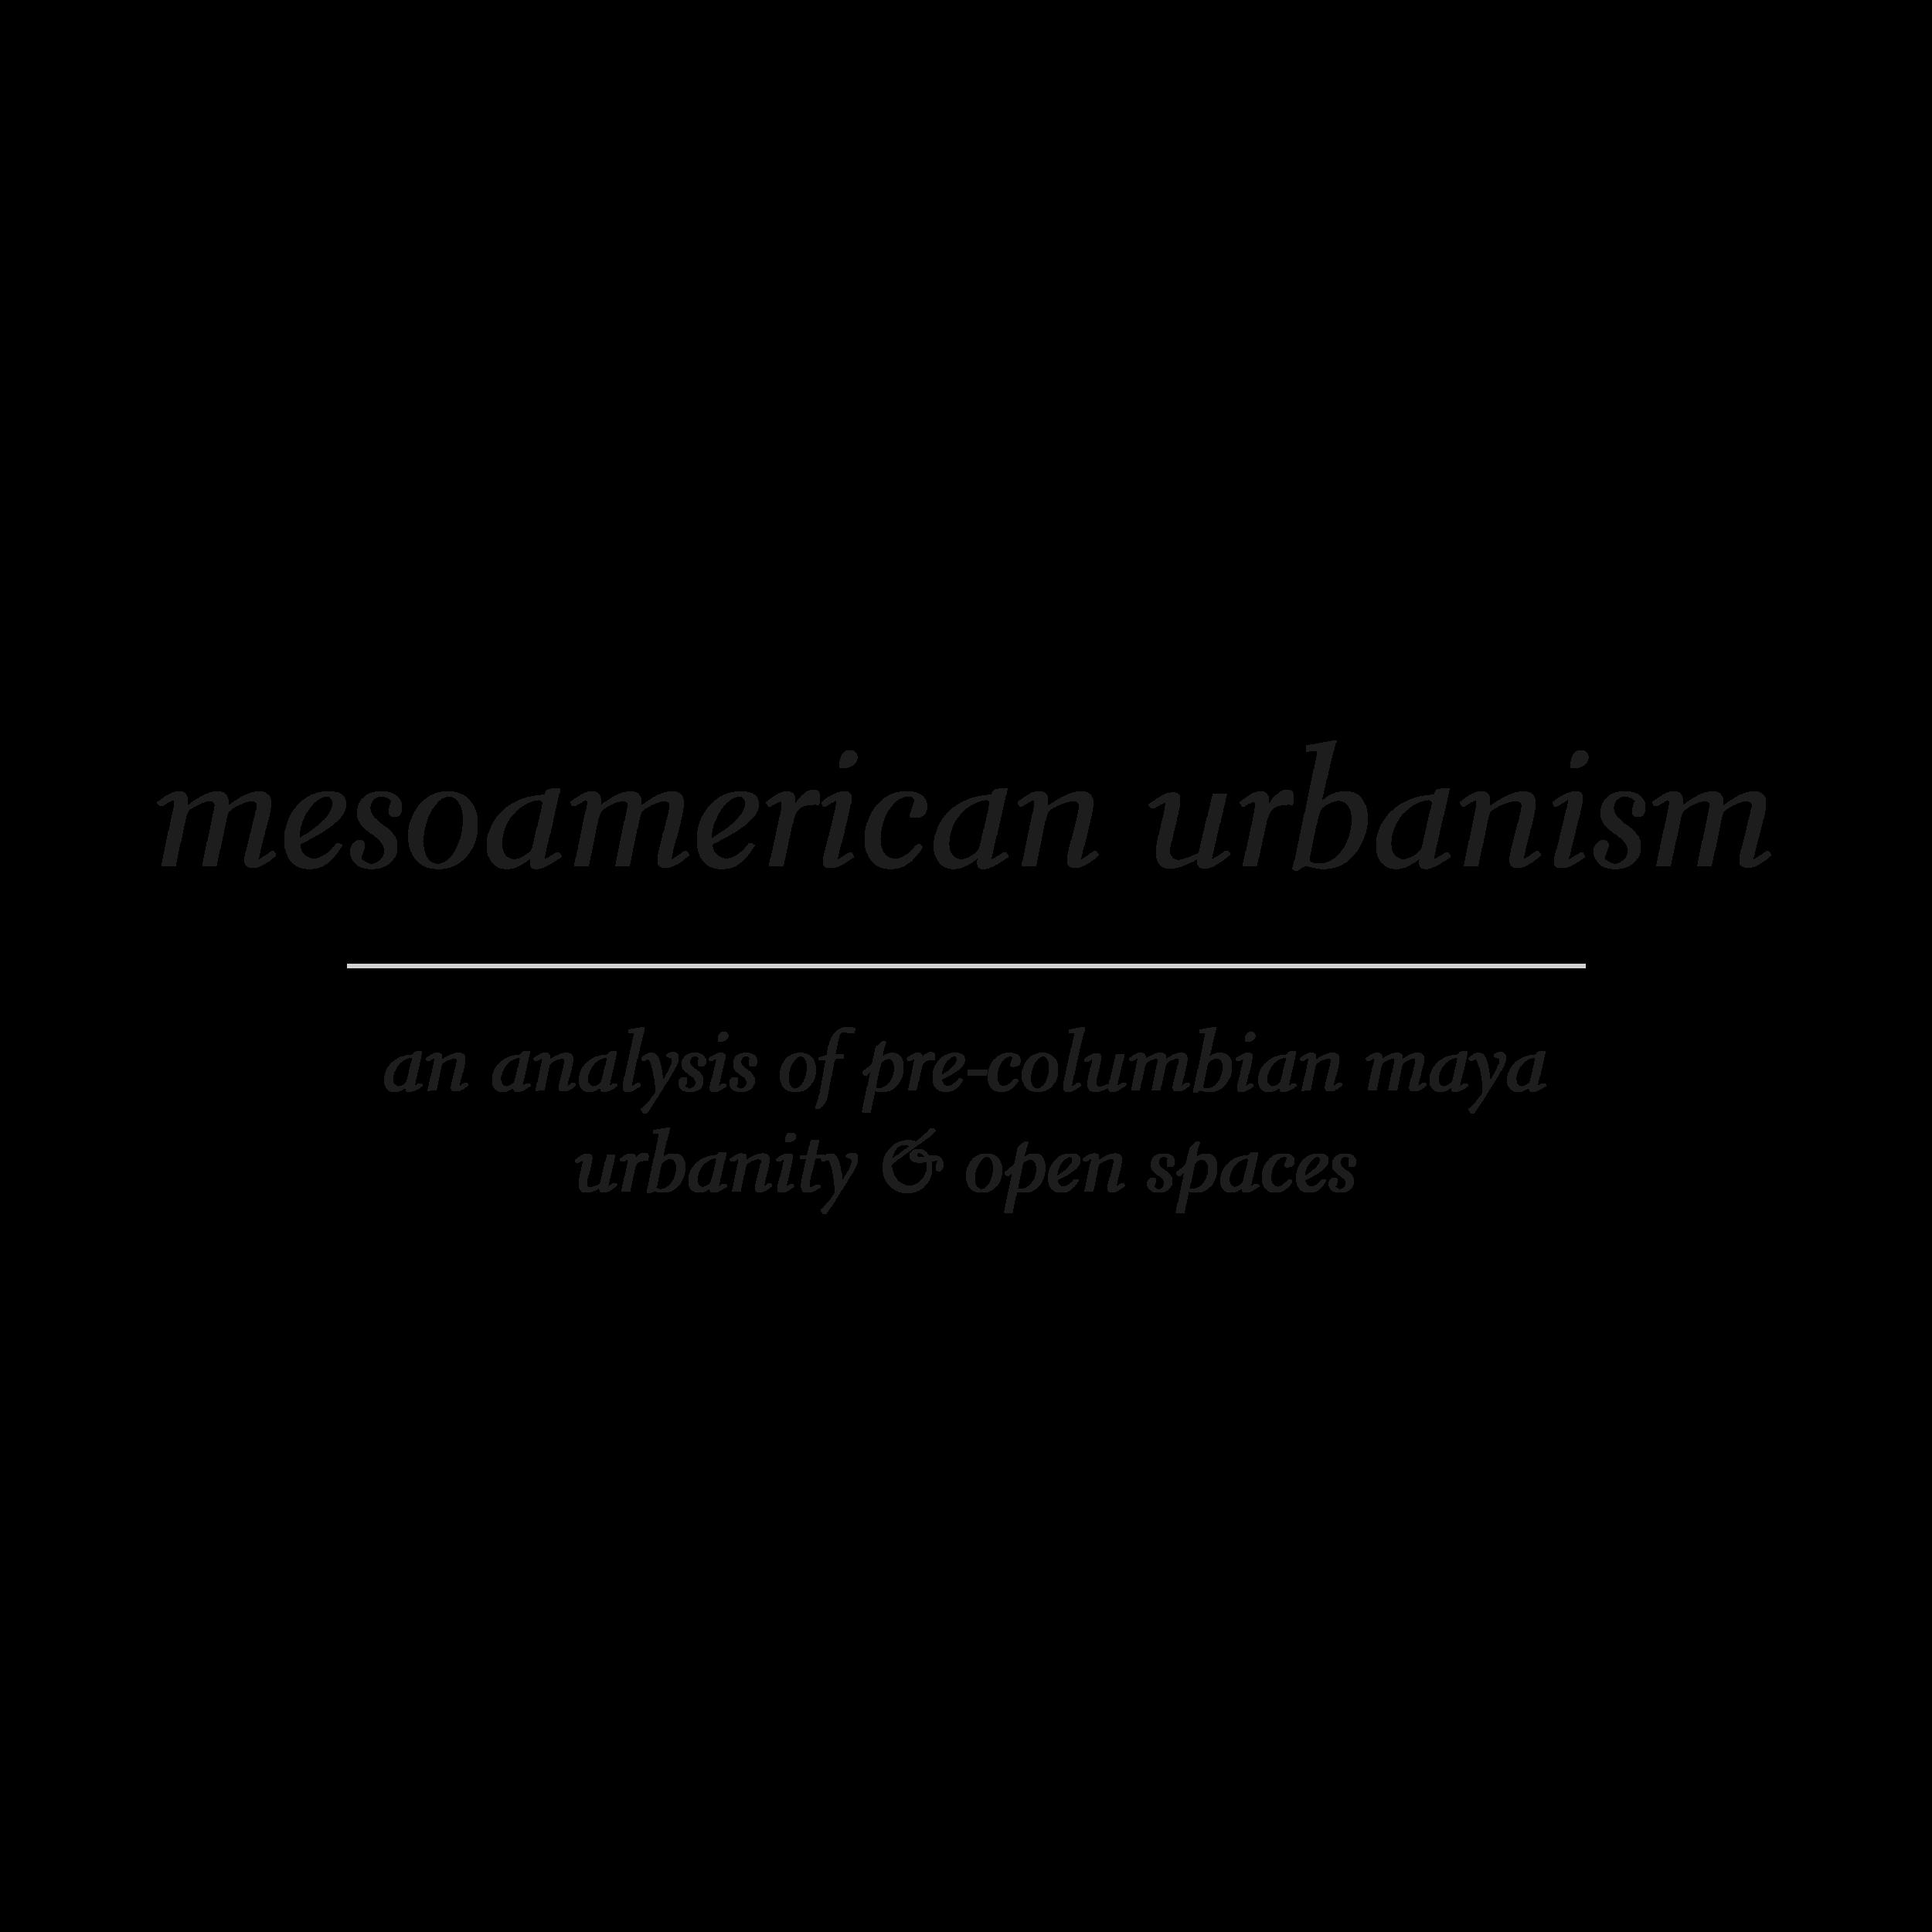 mesoamerican urbanism-01.png